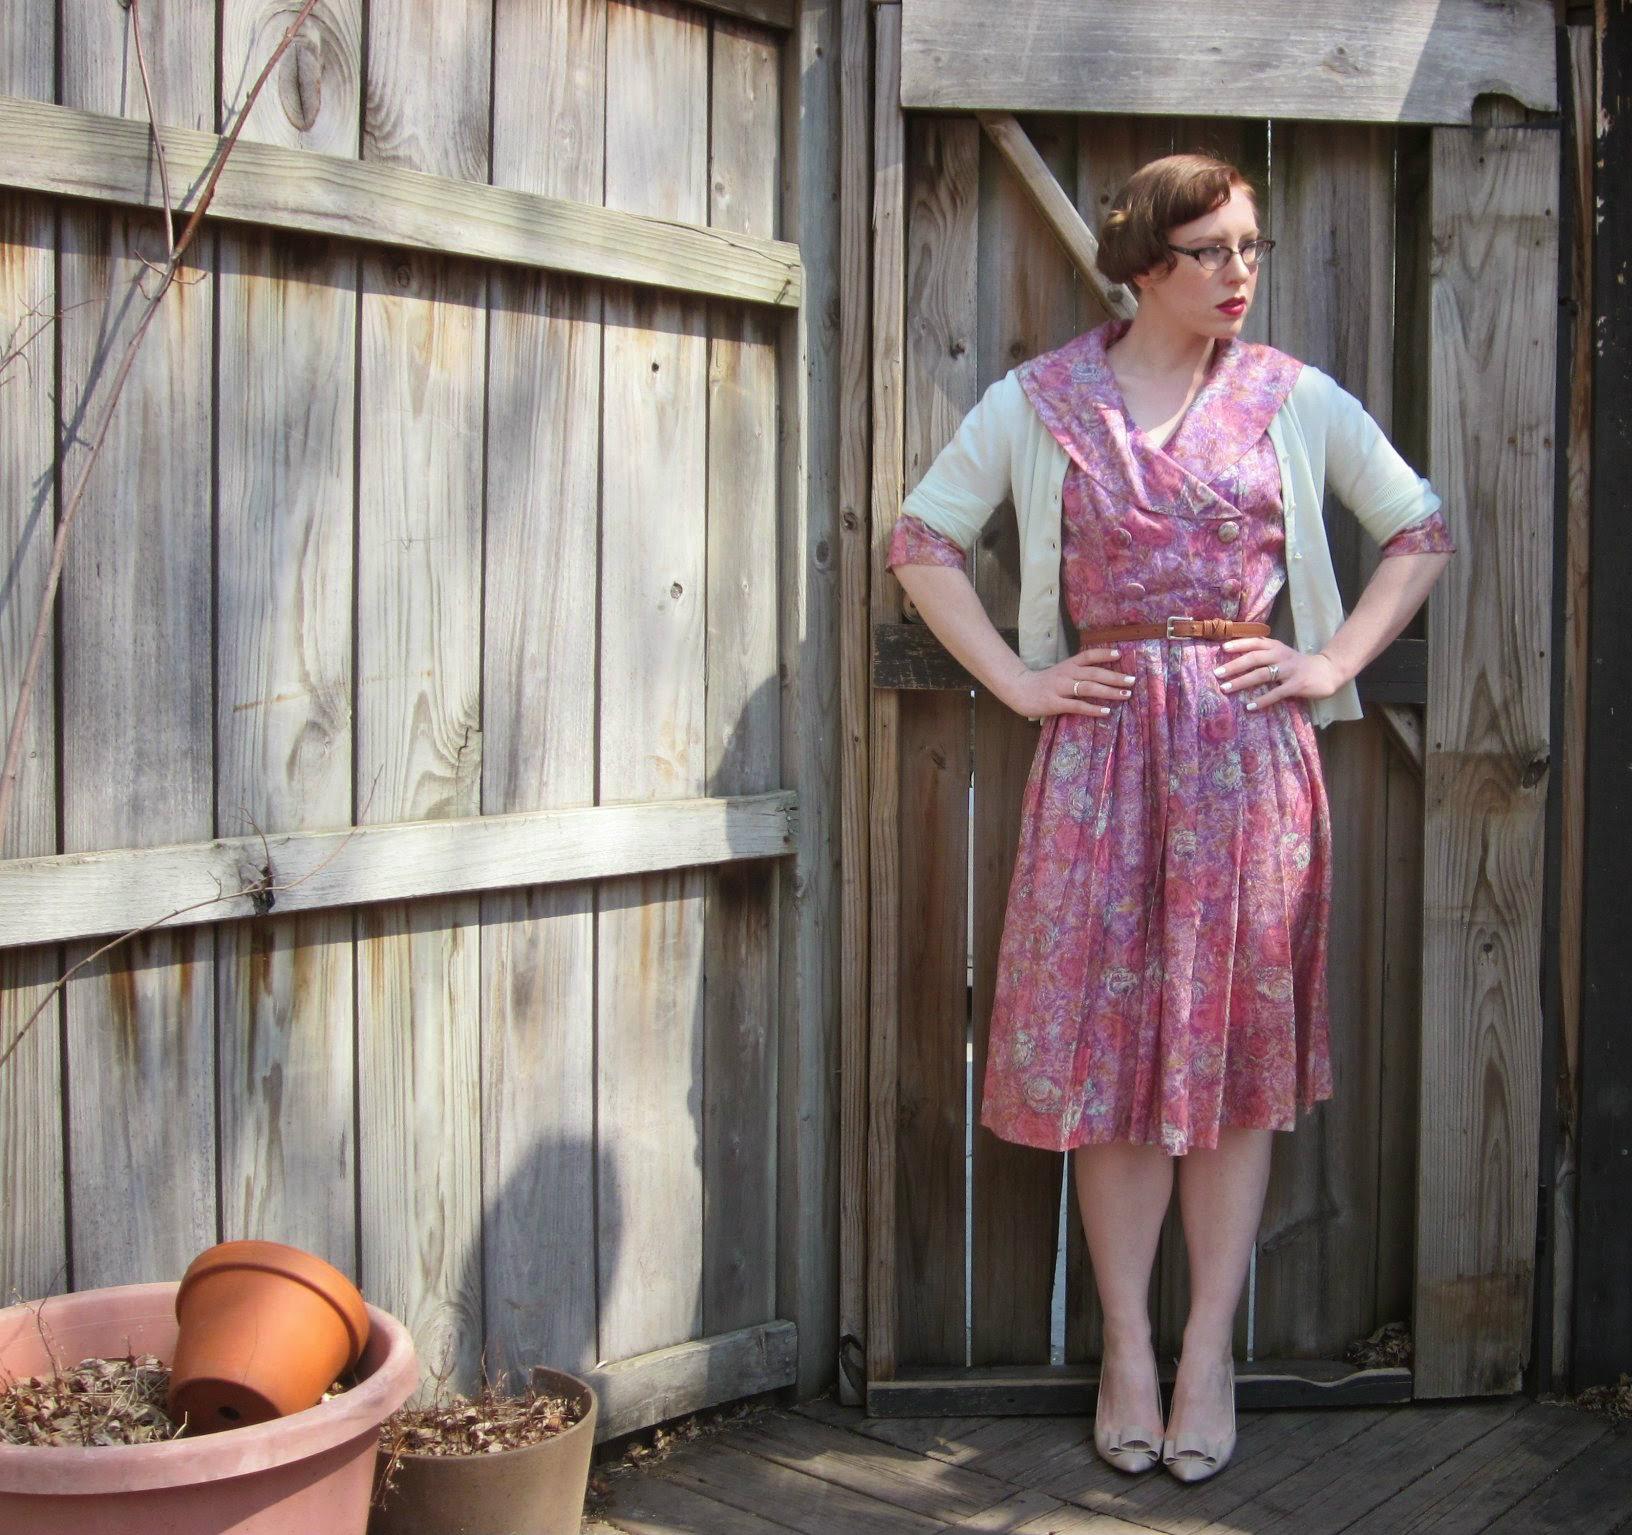 Dress: The Vintage Mistress via Etsy; Cardigan: JCrew; Shoes: Modcloth